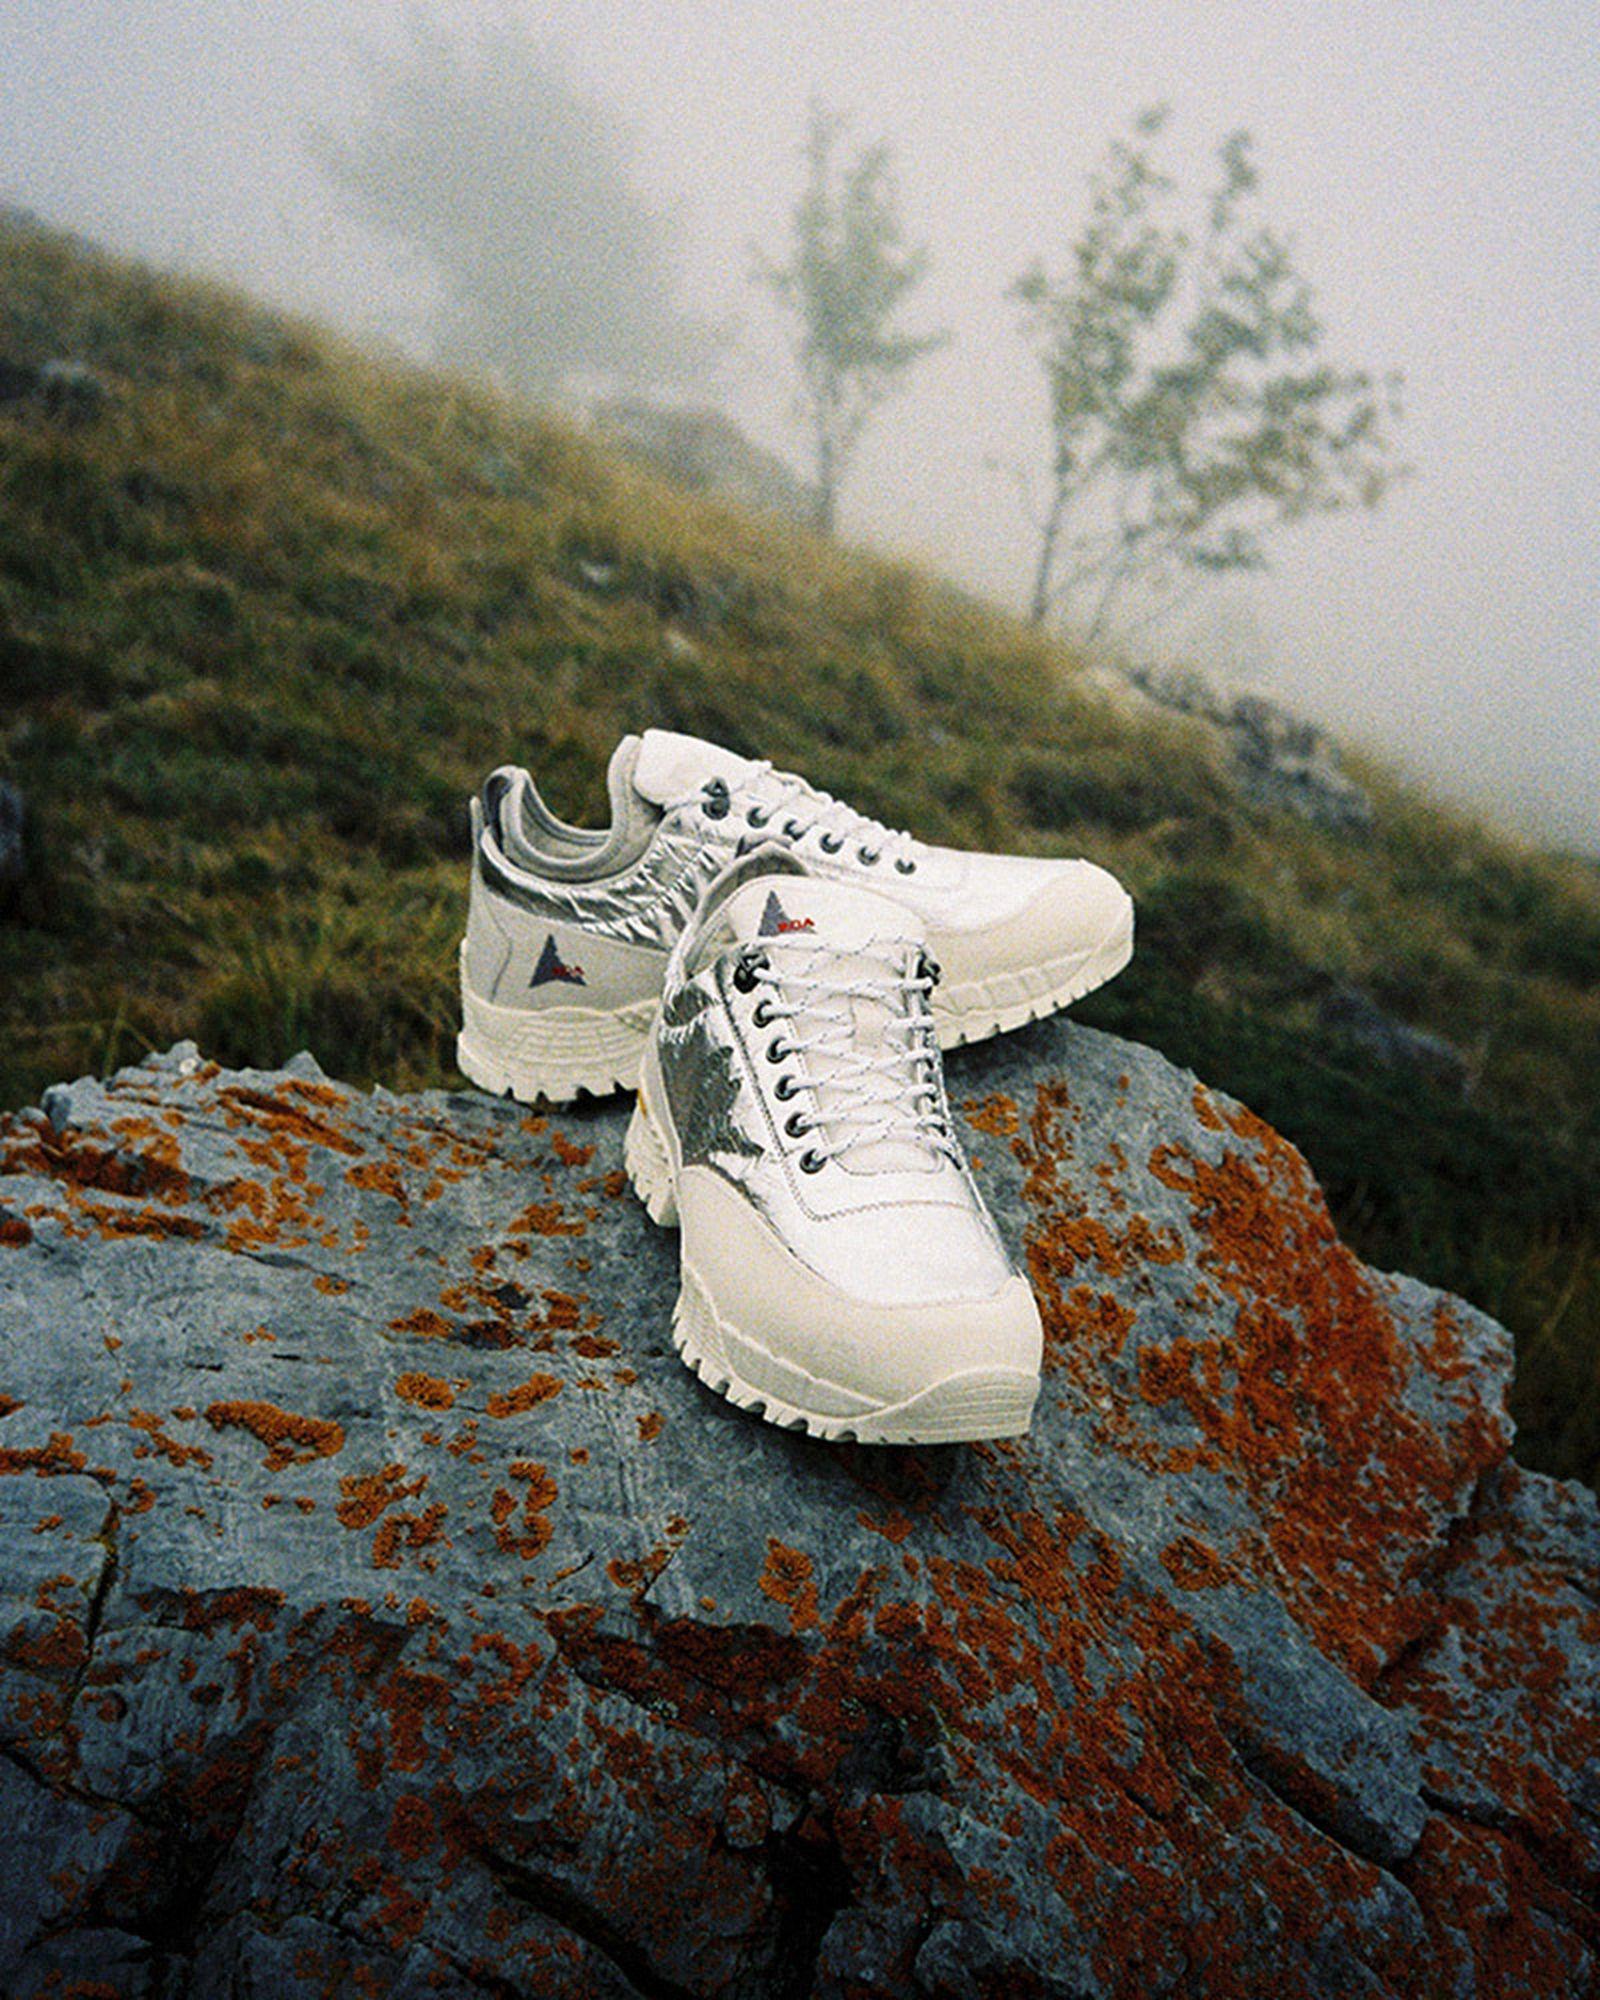 roa-hiking-interview-02